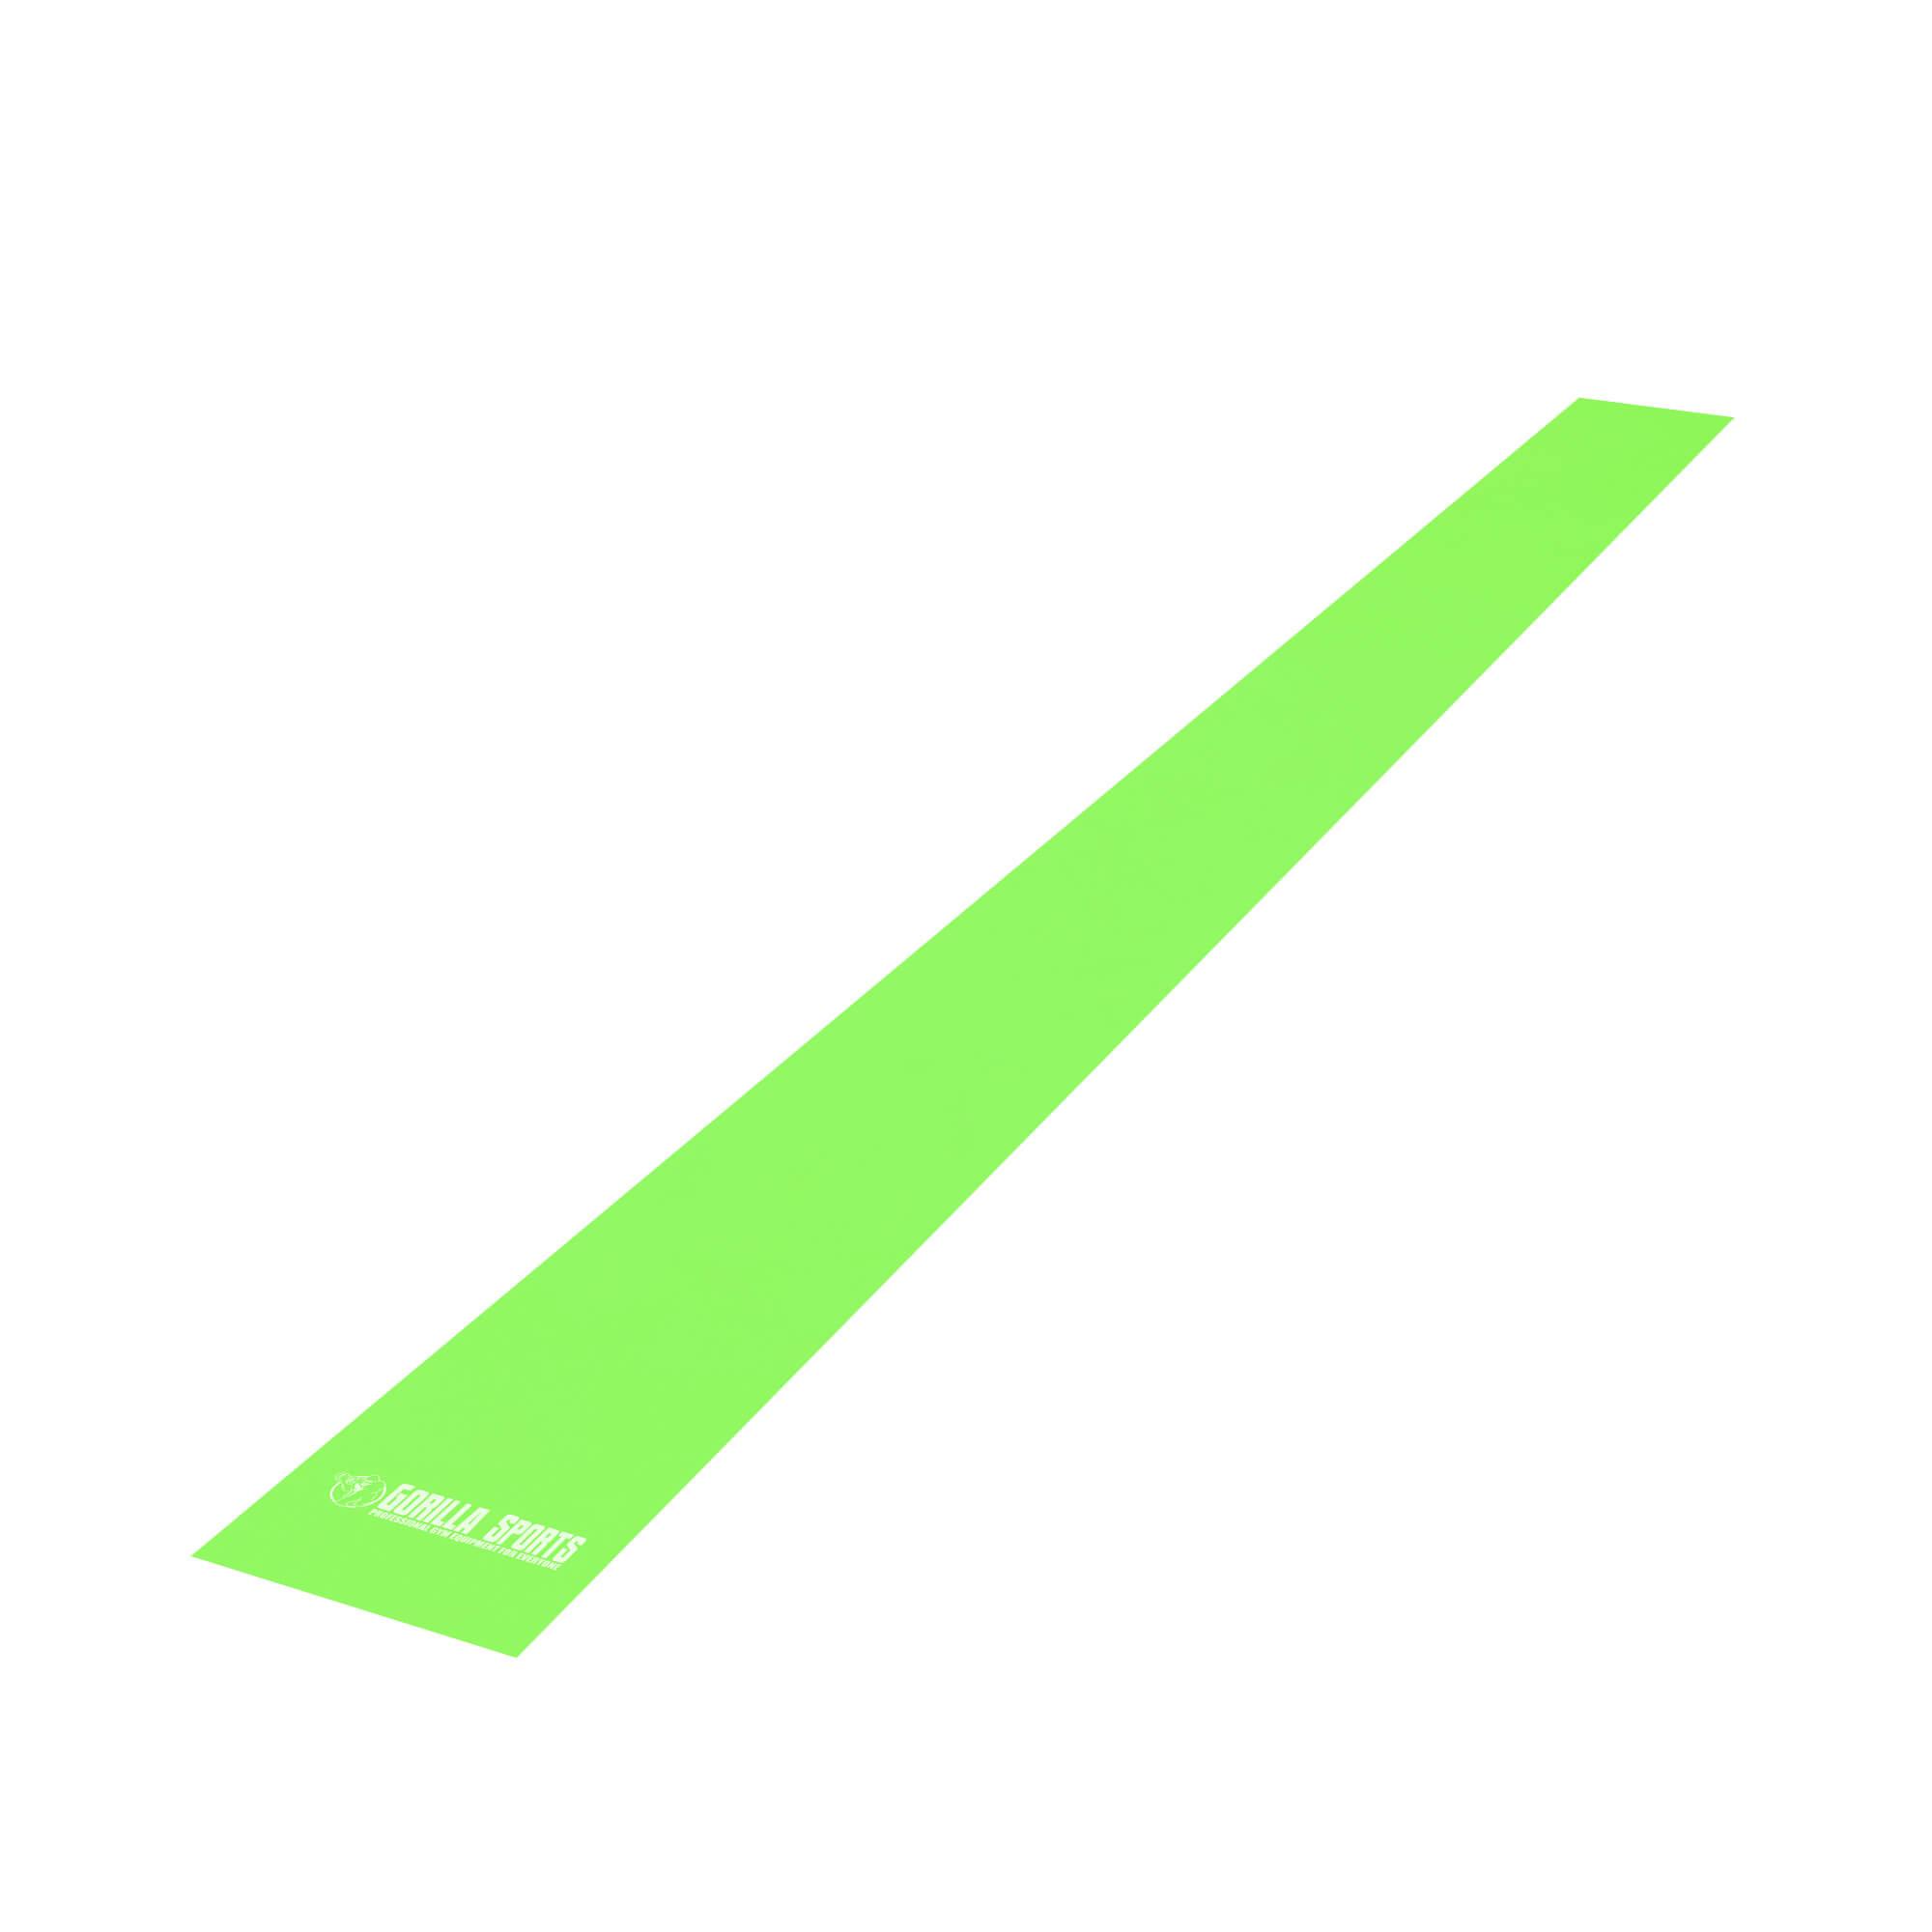 Fitnessband Latex Grün 120 cm